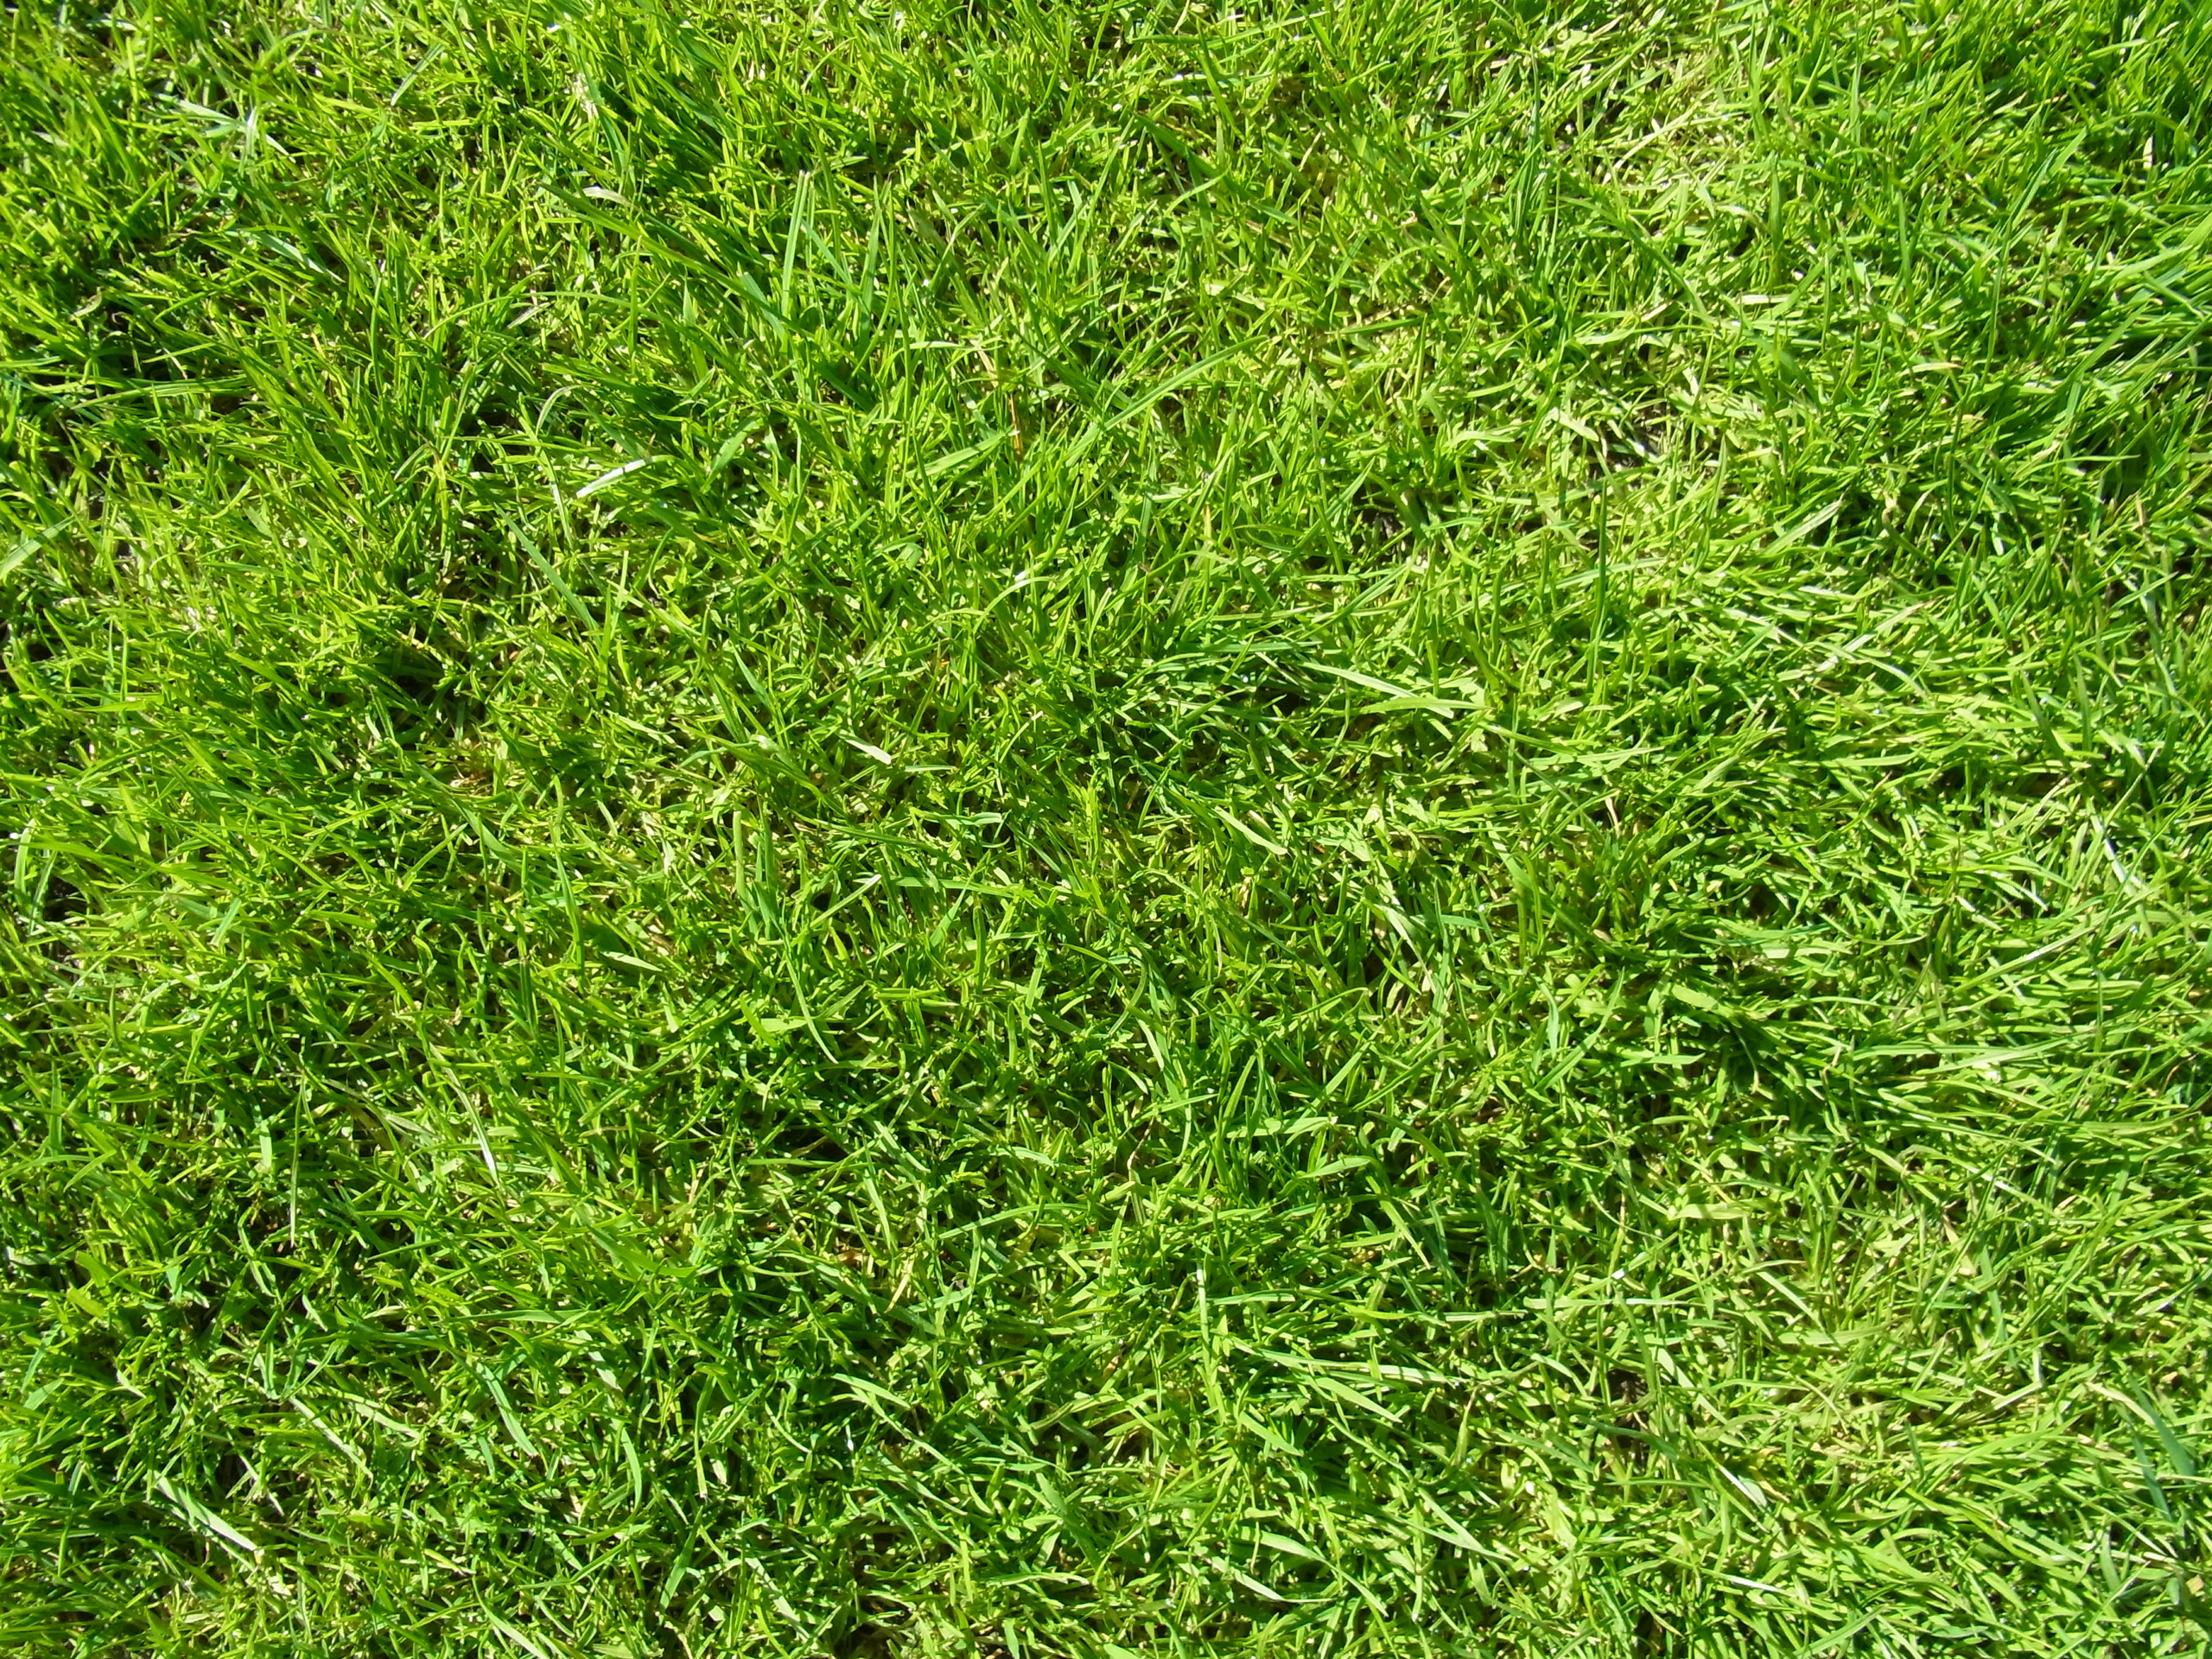 Nature S Lawn Norcross Ga